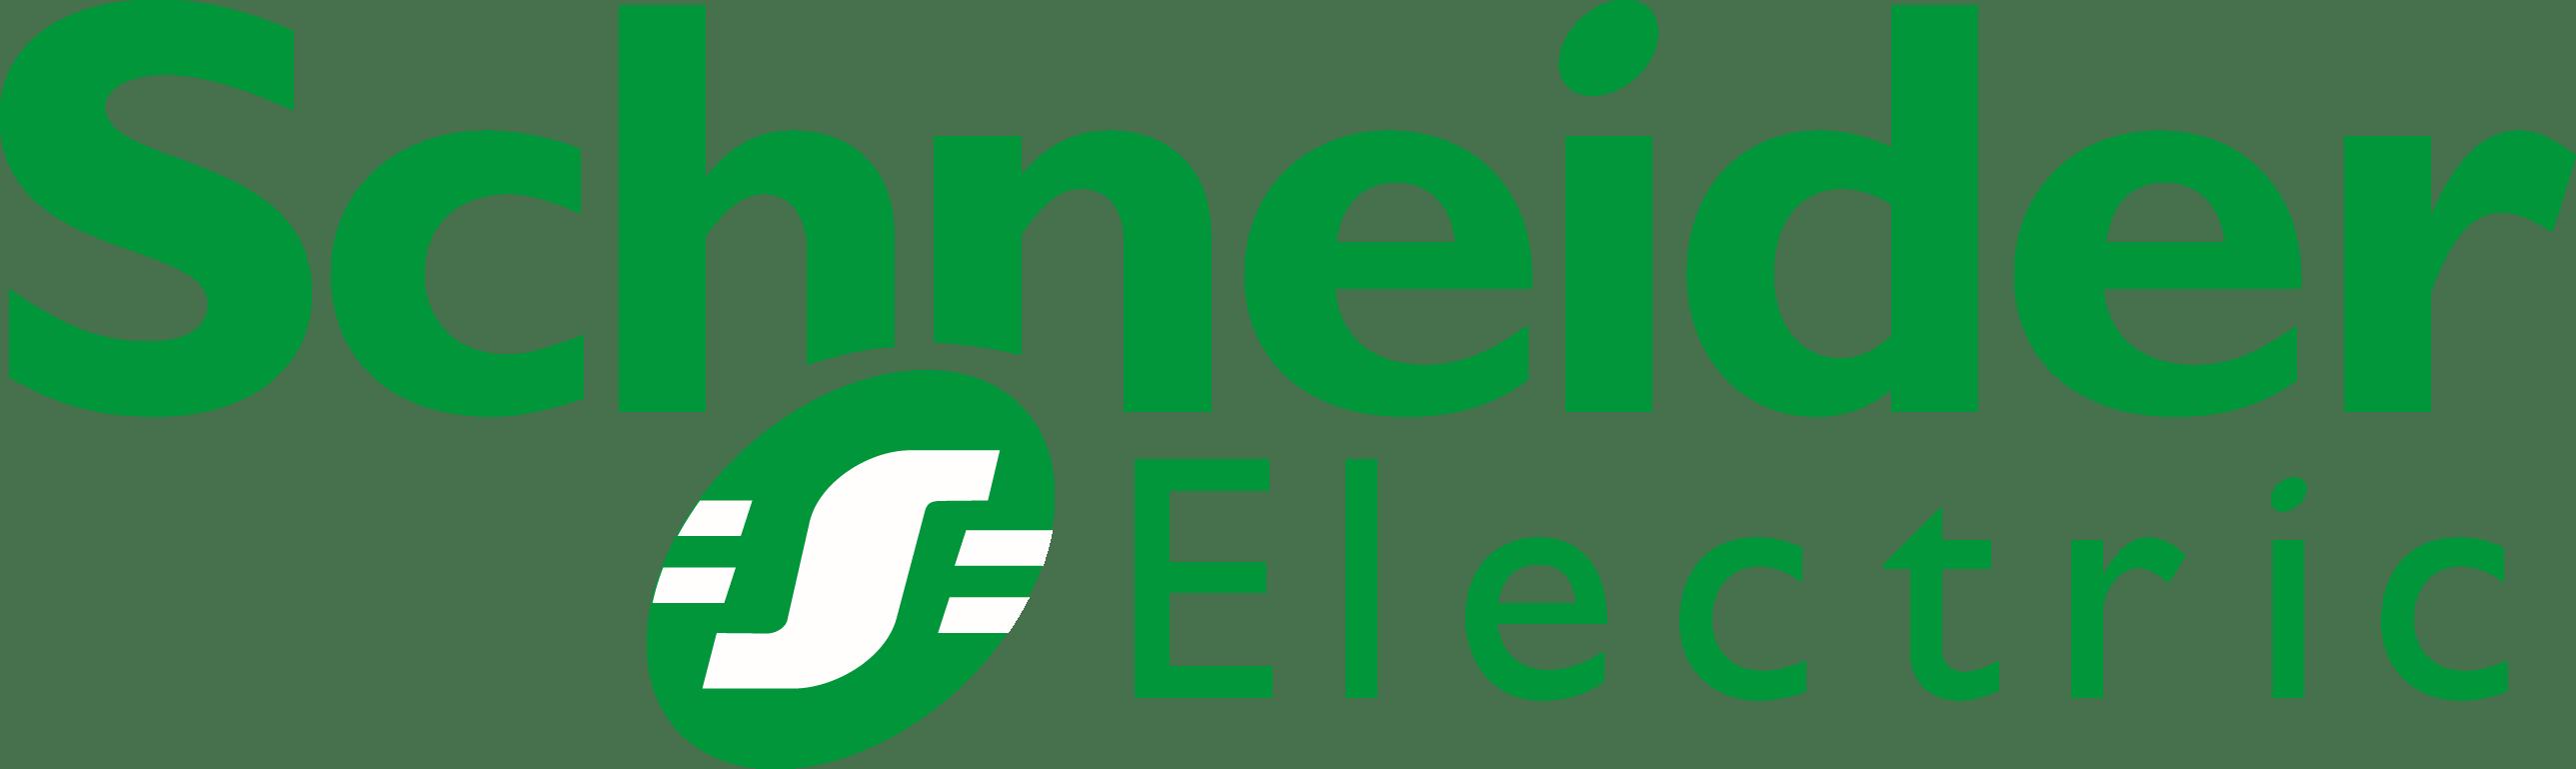 Schneider Electric Logo png